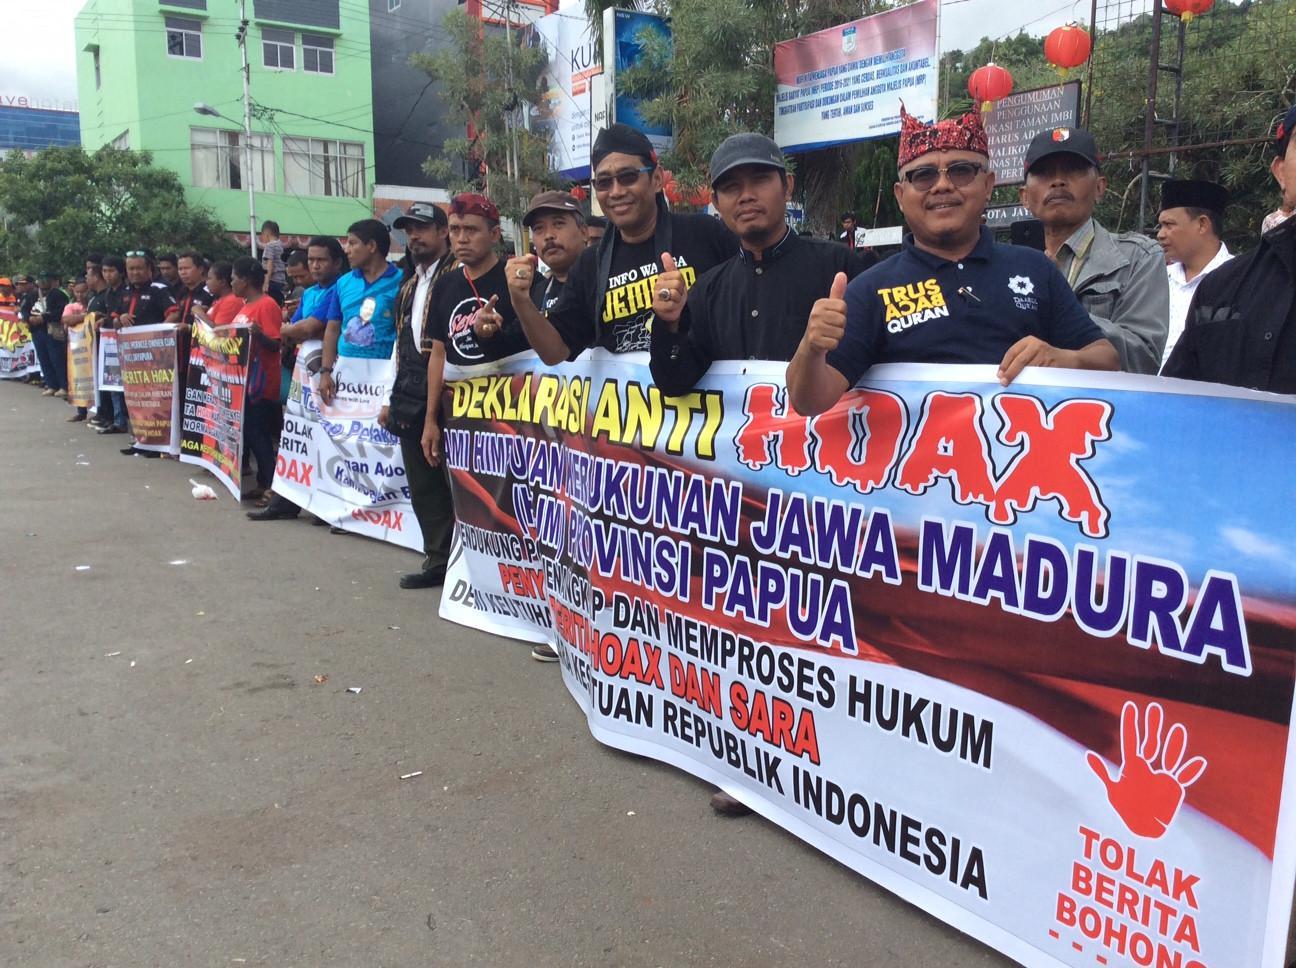 Paguyuban di Papua tolak hoax. (Liputan6.com / Katharina Janur)